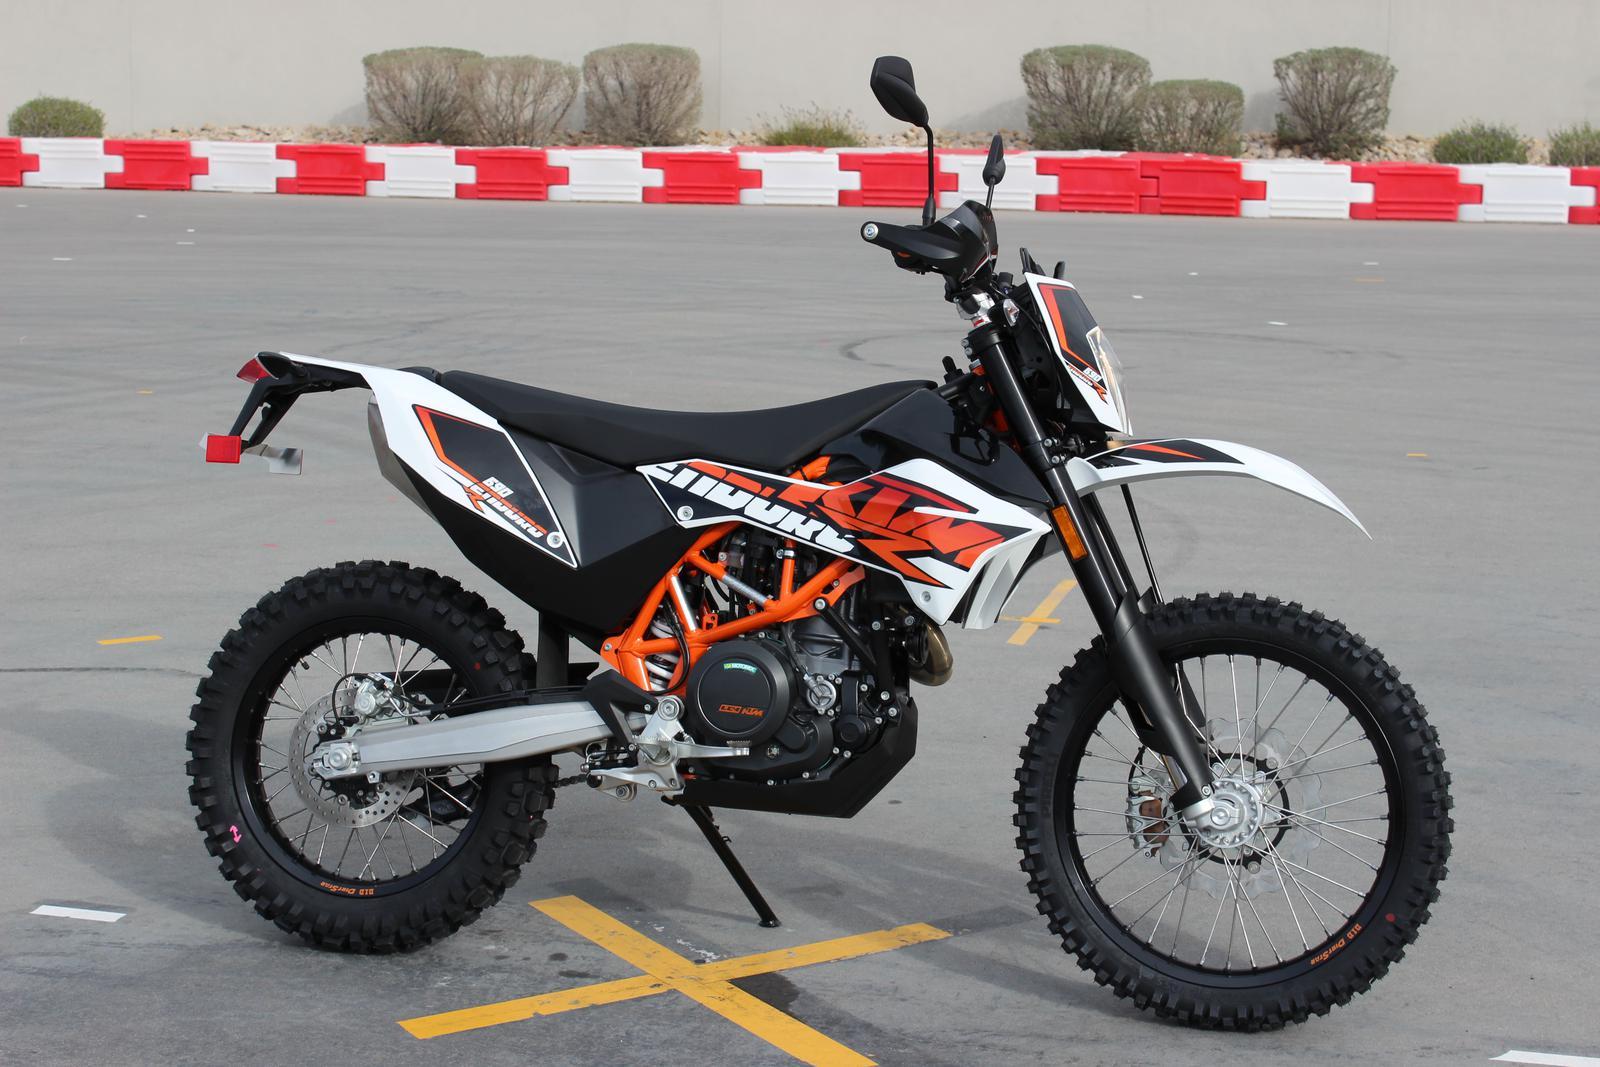 2018 Ktm 690 Enduro R For Sale In Scottsdale Az Go Az